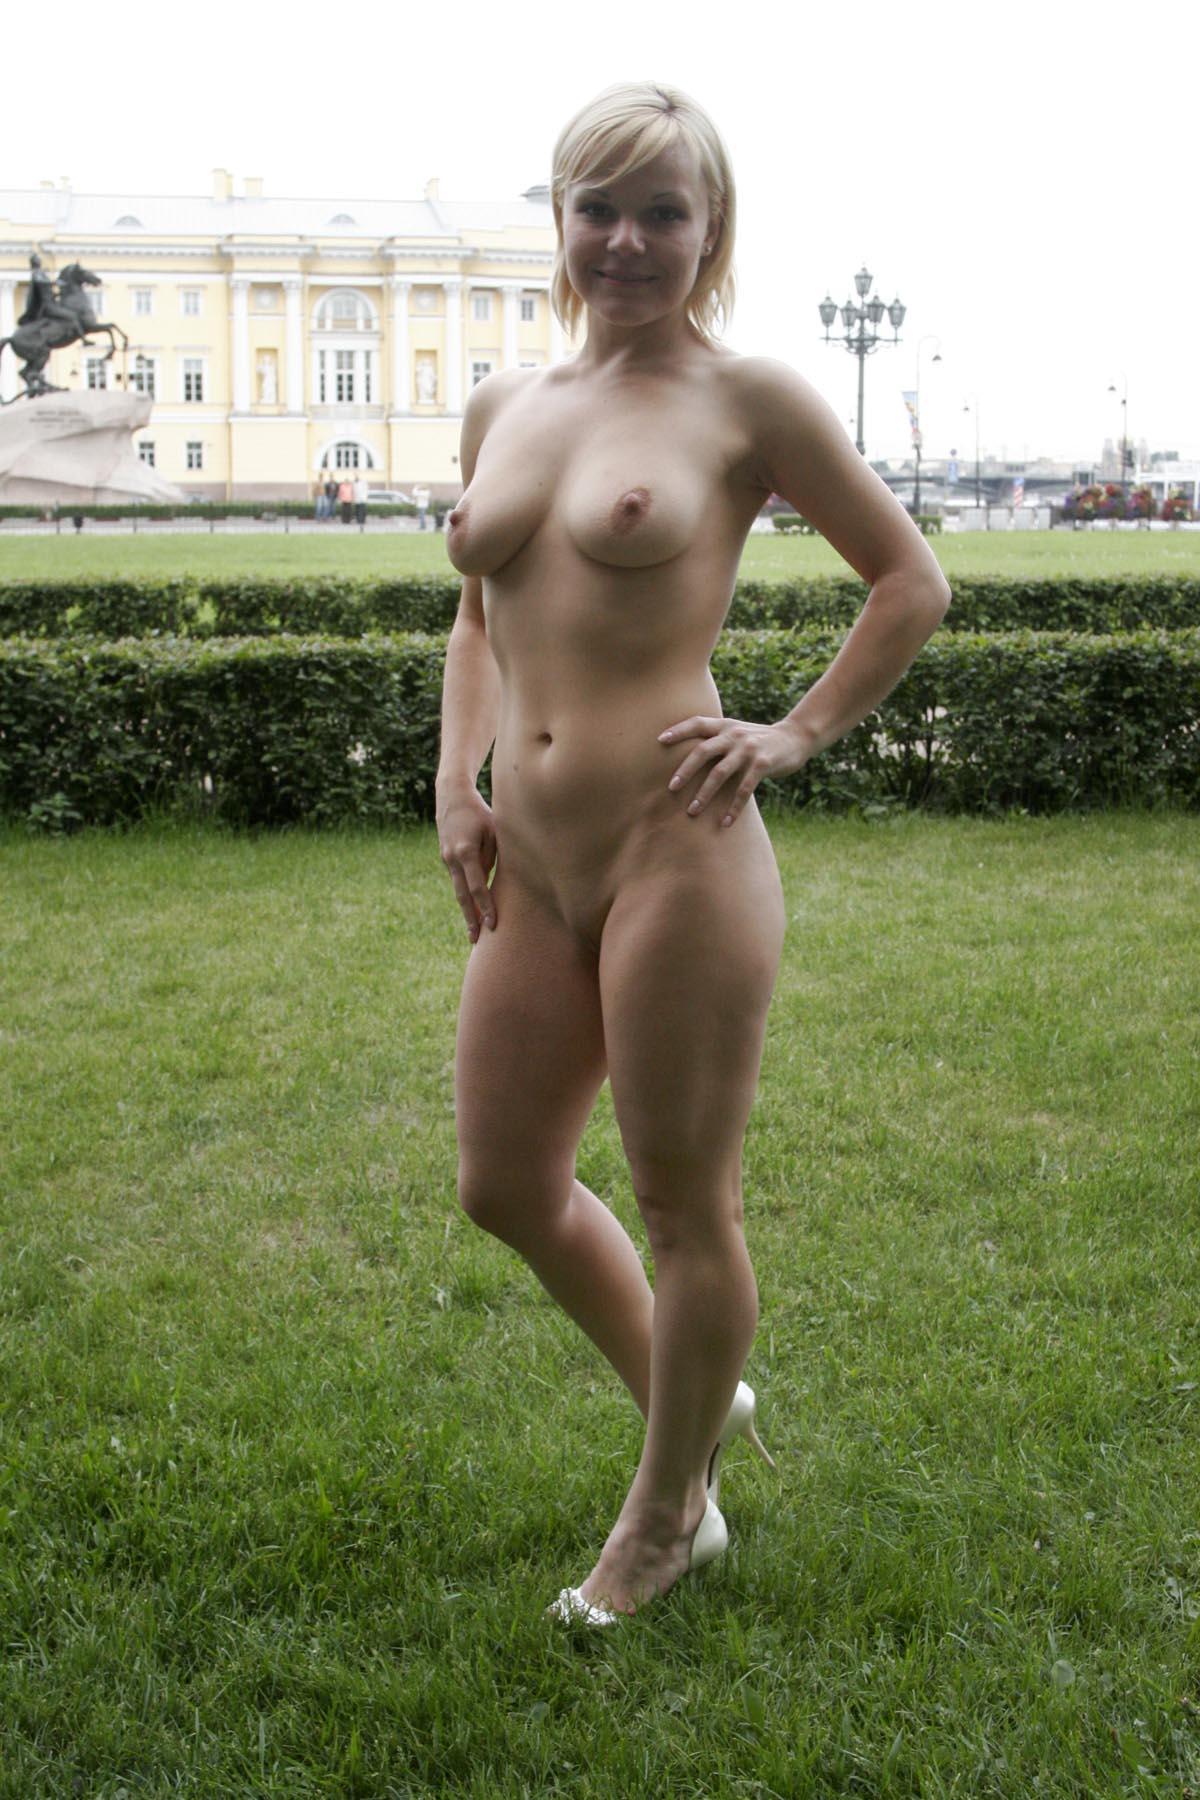 Risk seem short nude hair girls remarkable, very